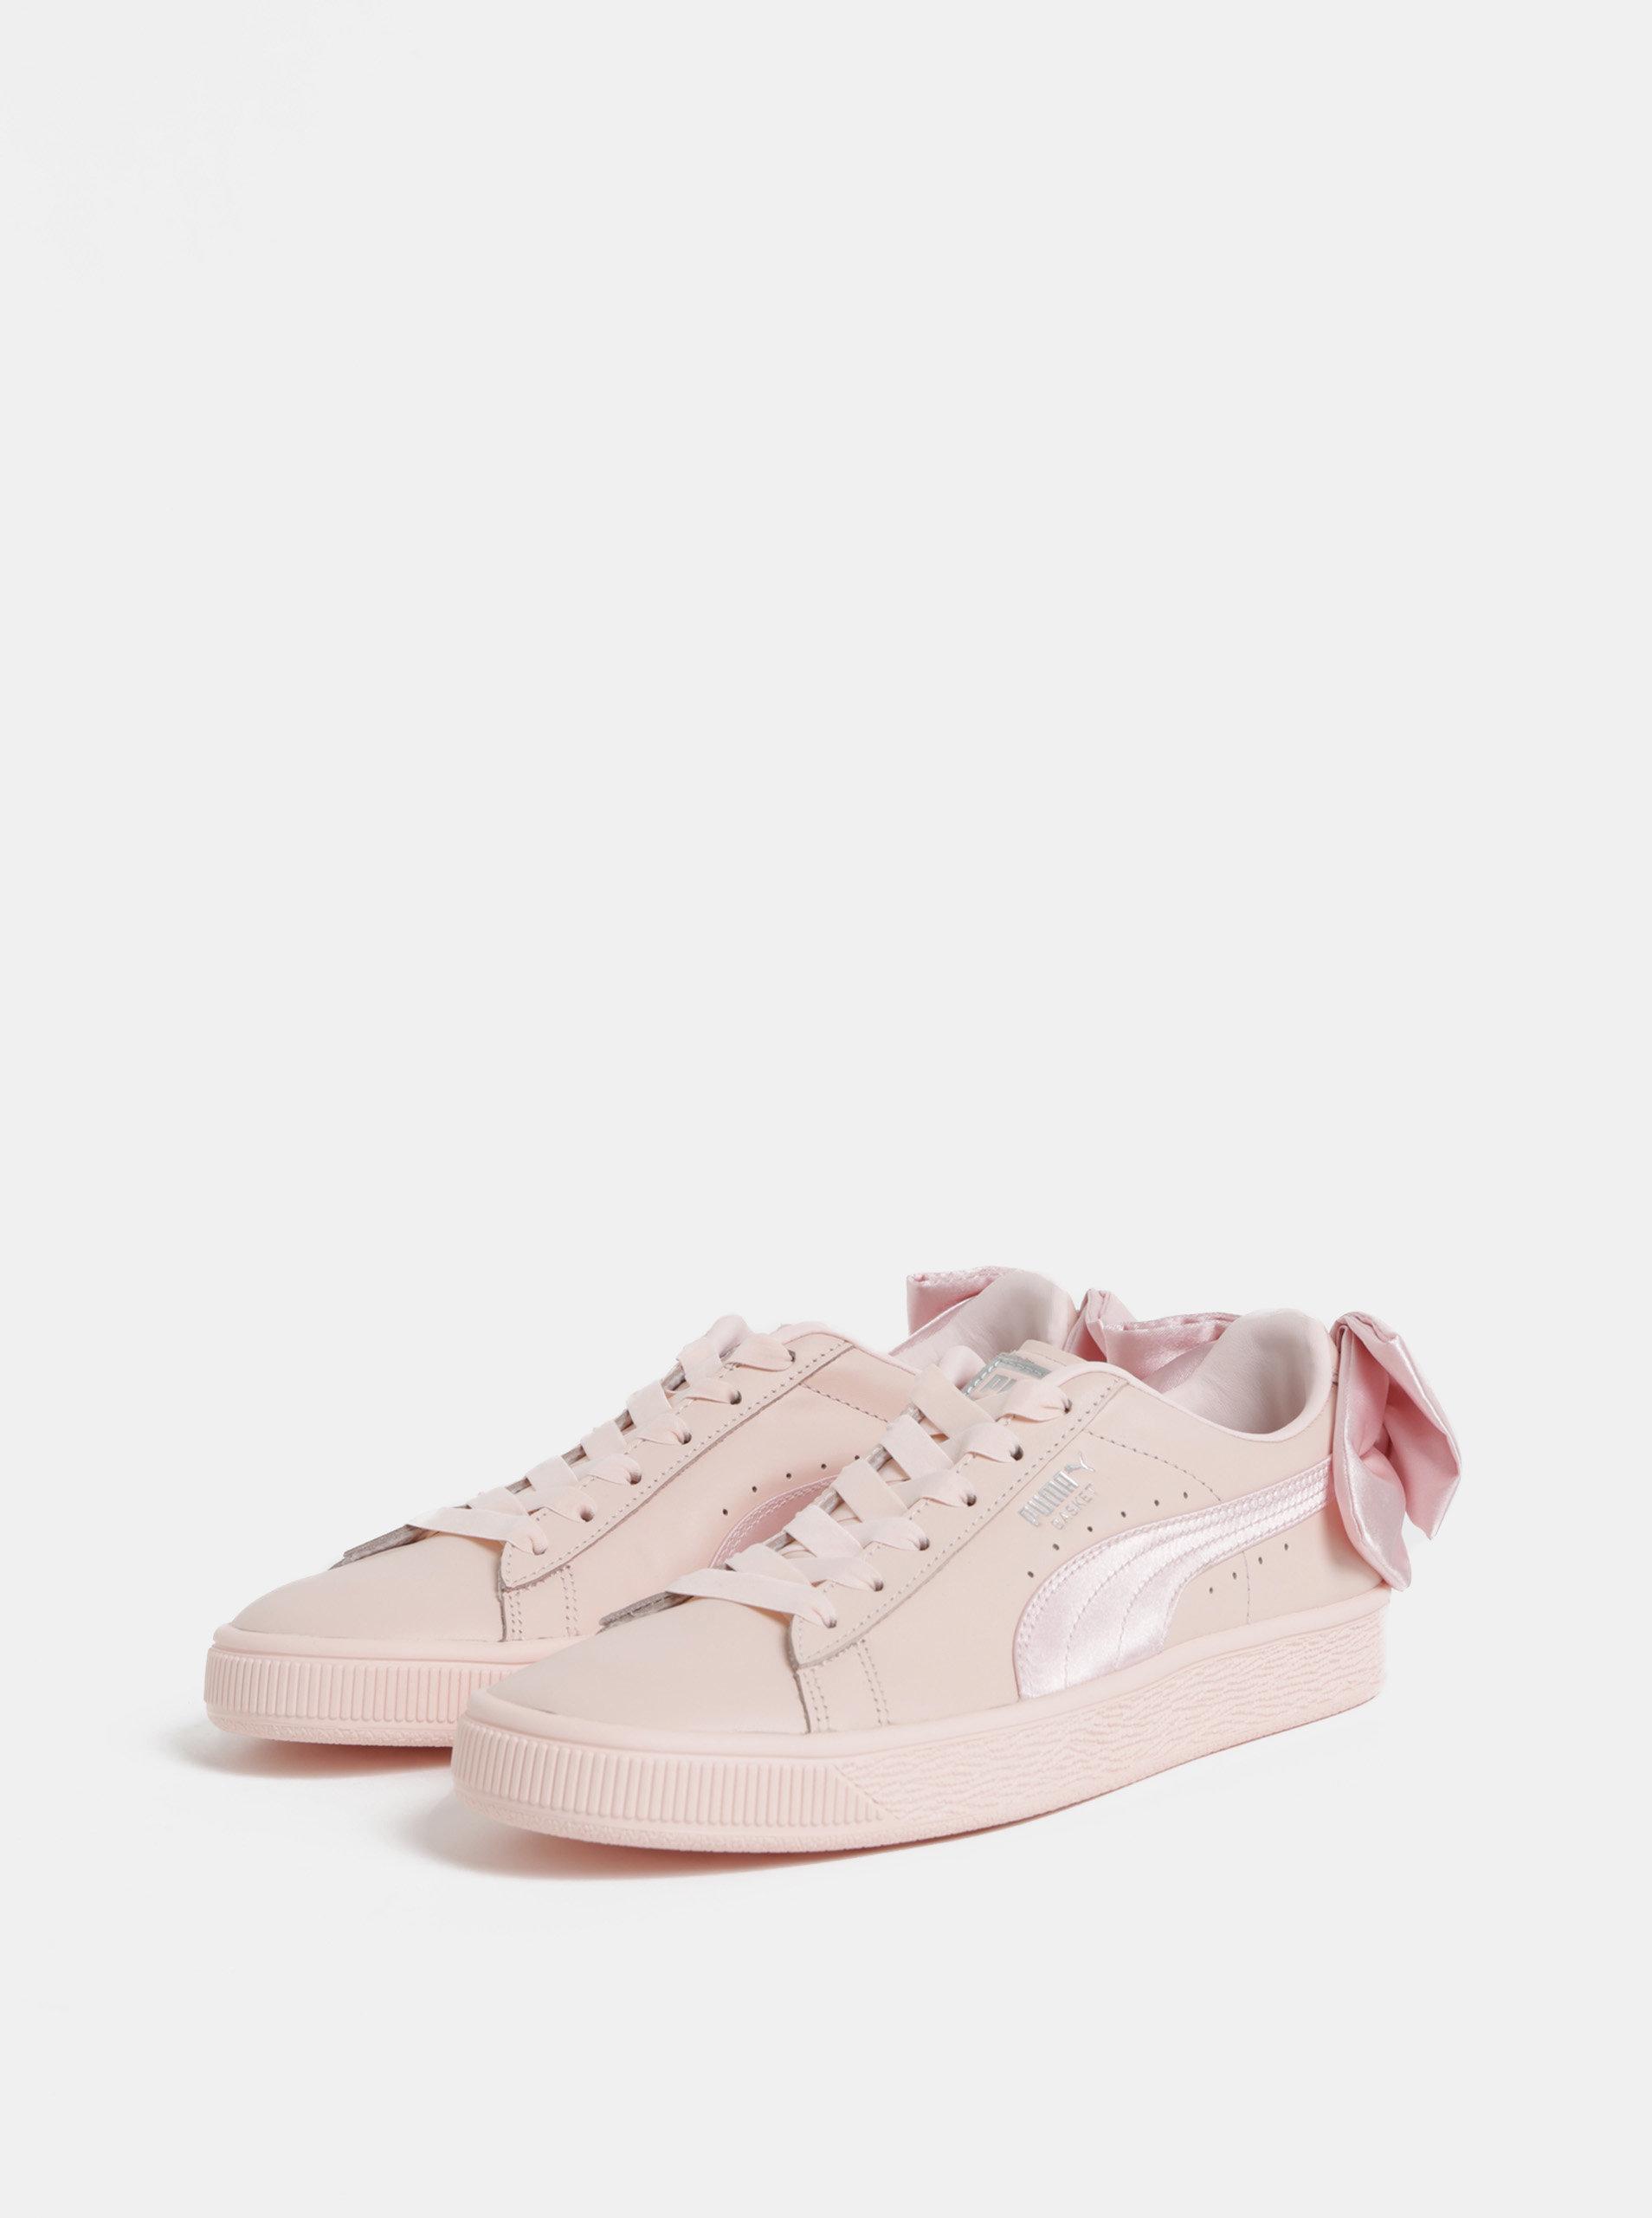 Svetloružové dámske kožené tenisky s mašľou Puma Basket ... ce9dcc0dcde